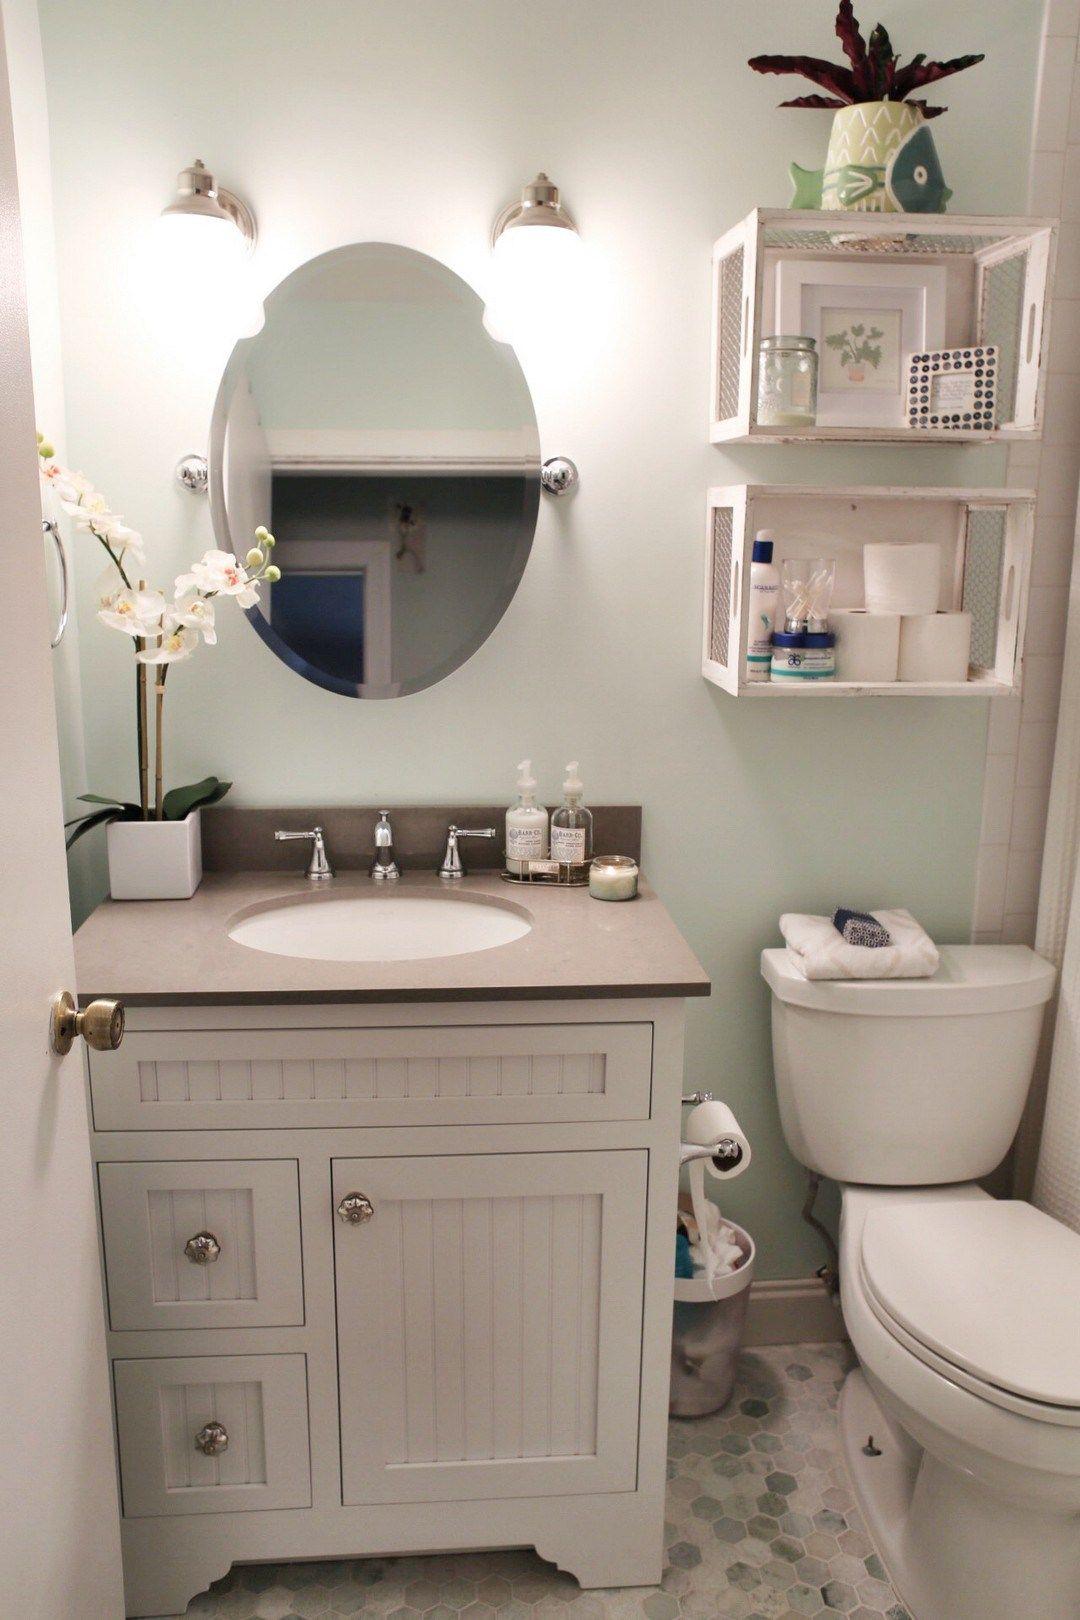 99 Small Master Bathroom Makeover Ideas On A Budget 32 Small Bathroom Renovations Spa Inspired Bathroom